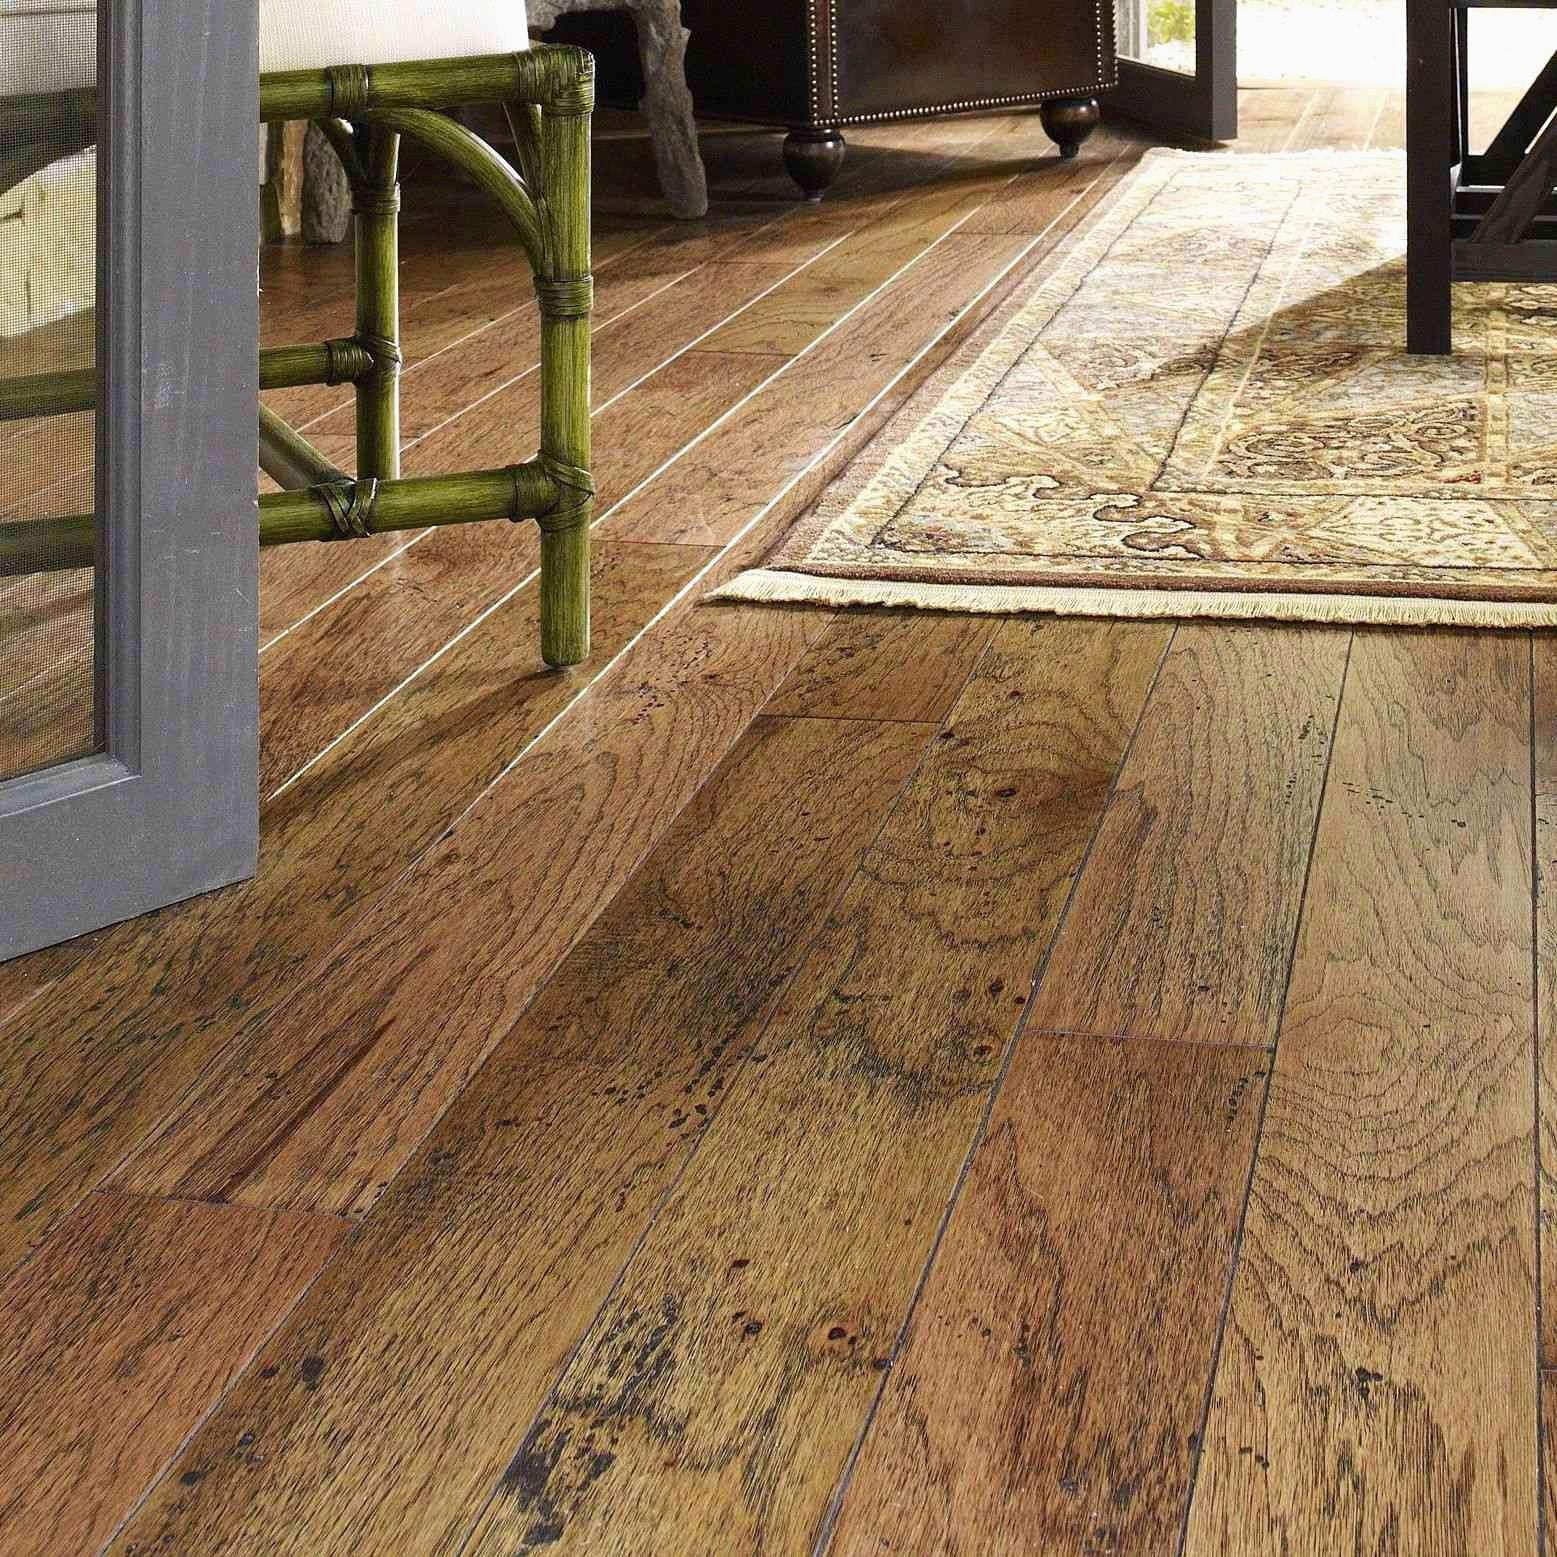 vinyl hardwood flooring of 42 qualified vinyl plank flooring over tile peritile in best way to clean vinyl plank floors best how to clean and shine real hardwood